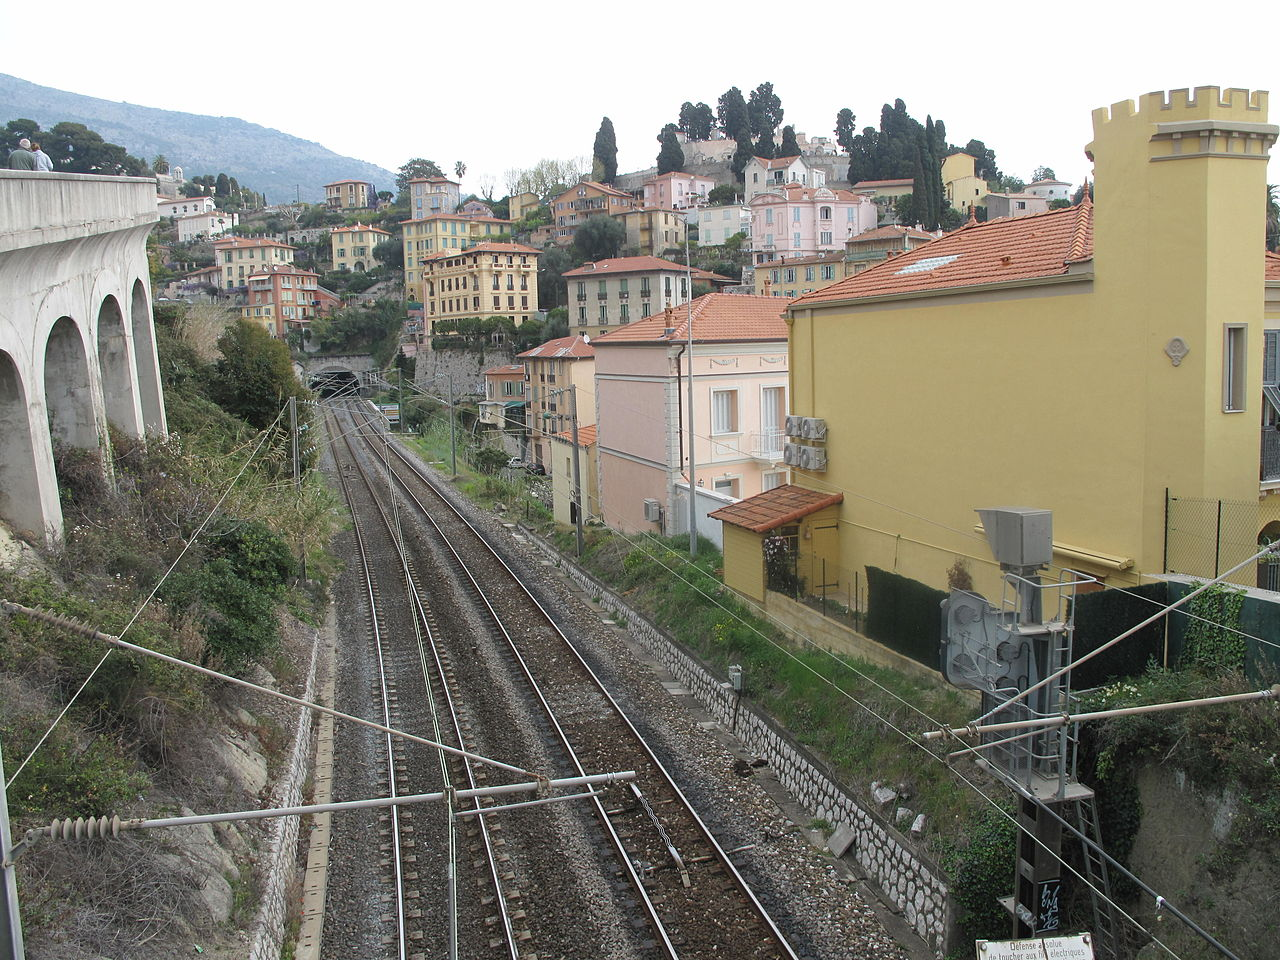 rail_tracks_menton_to_vintimiglia.jpg